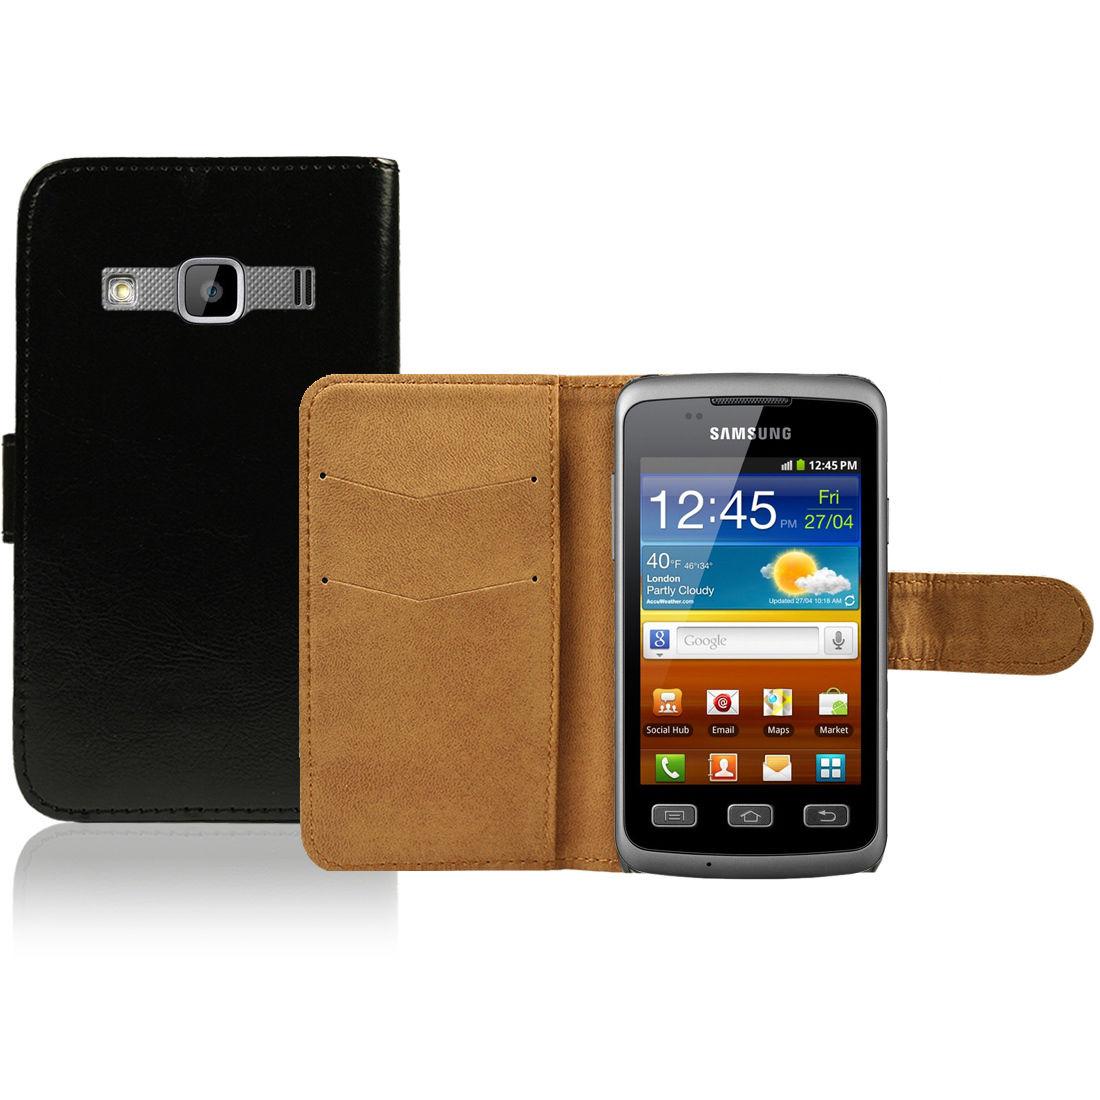 Pouzdro pro Samsung Galaxy Xcover 3 černé